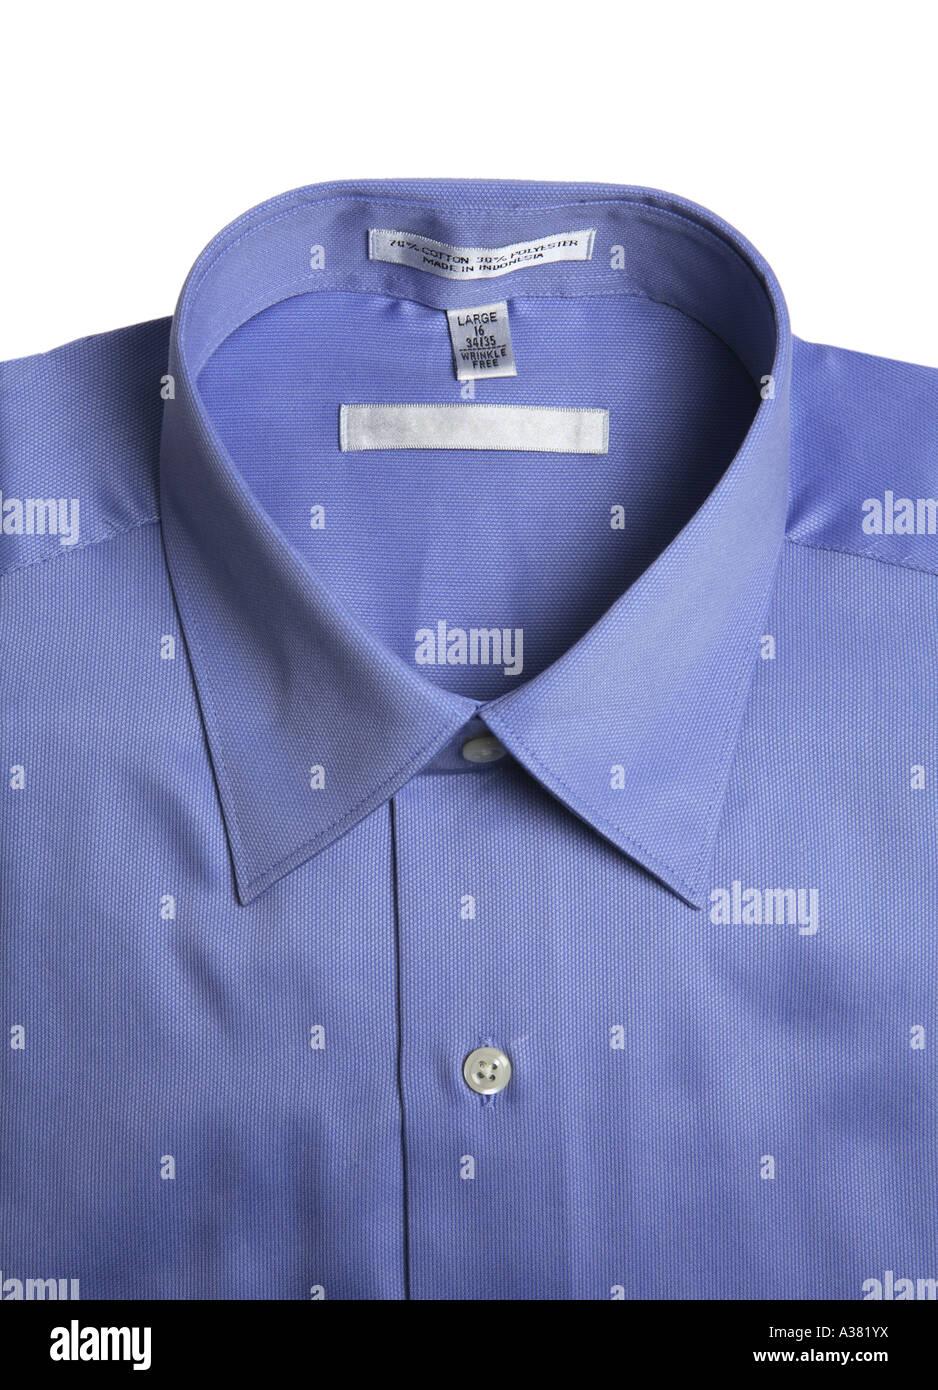 Collare blu T-Shirt Immagini Stock